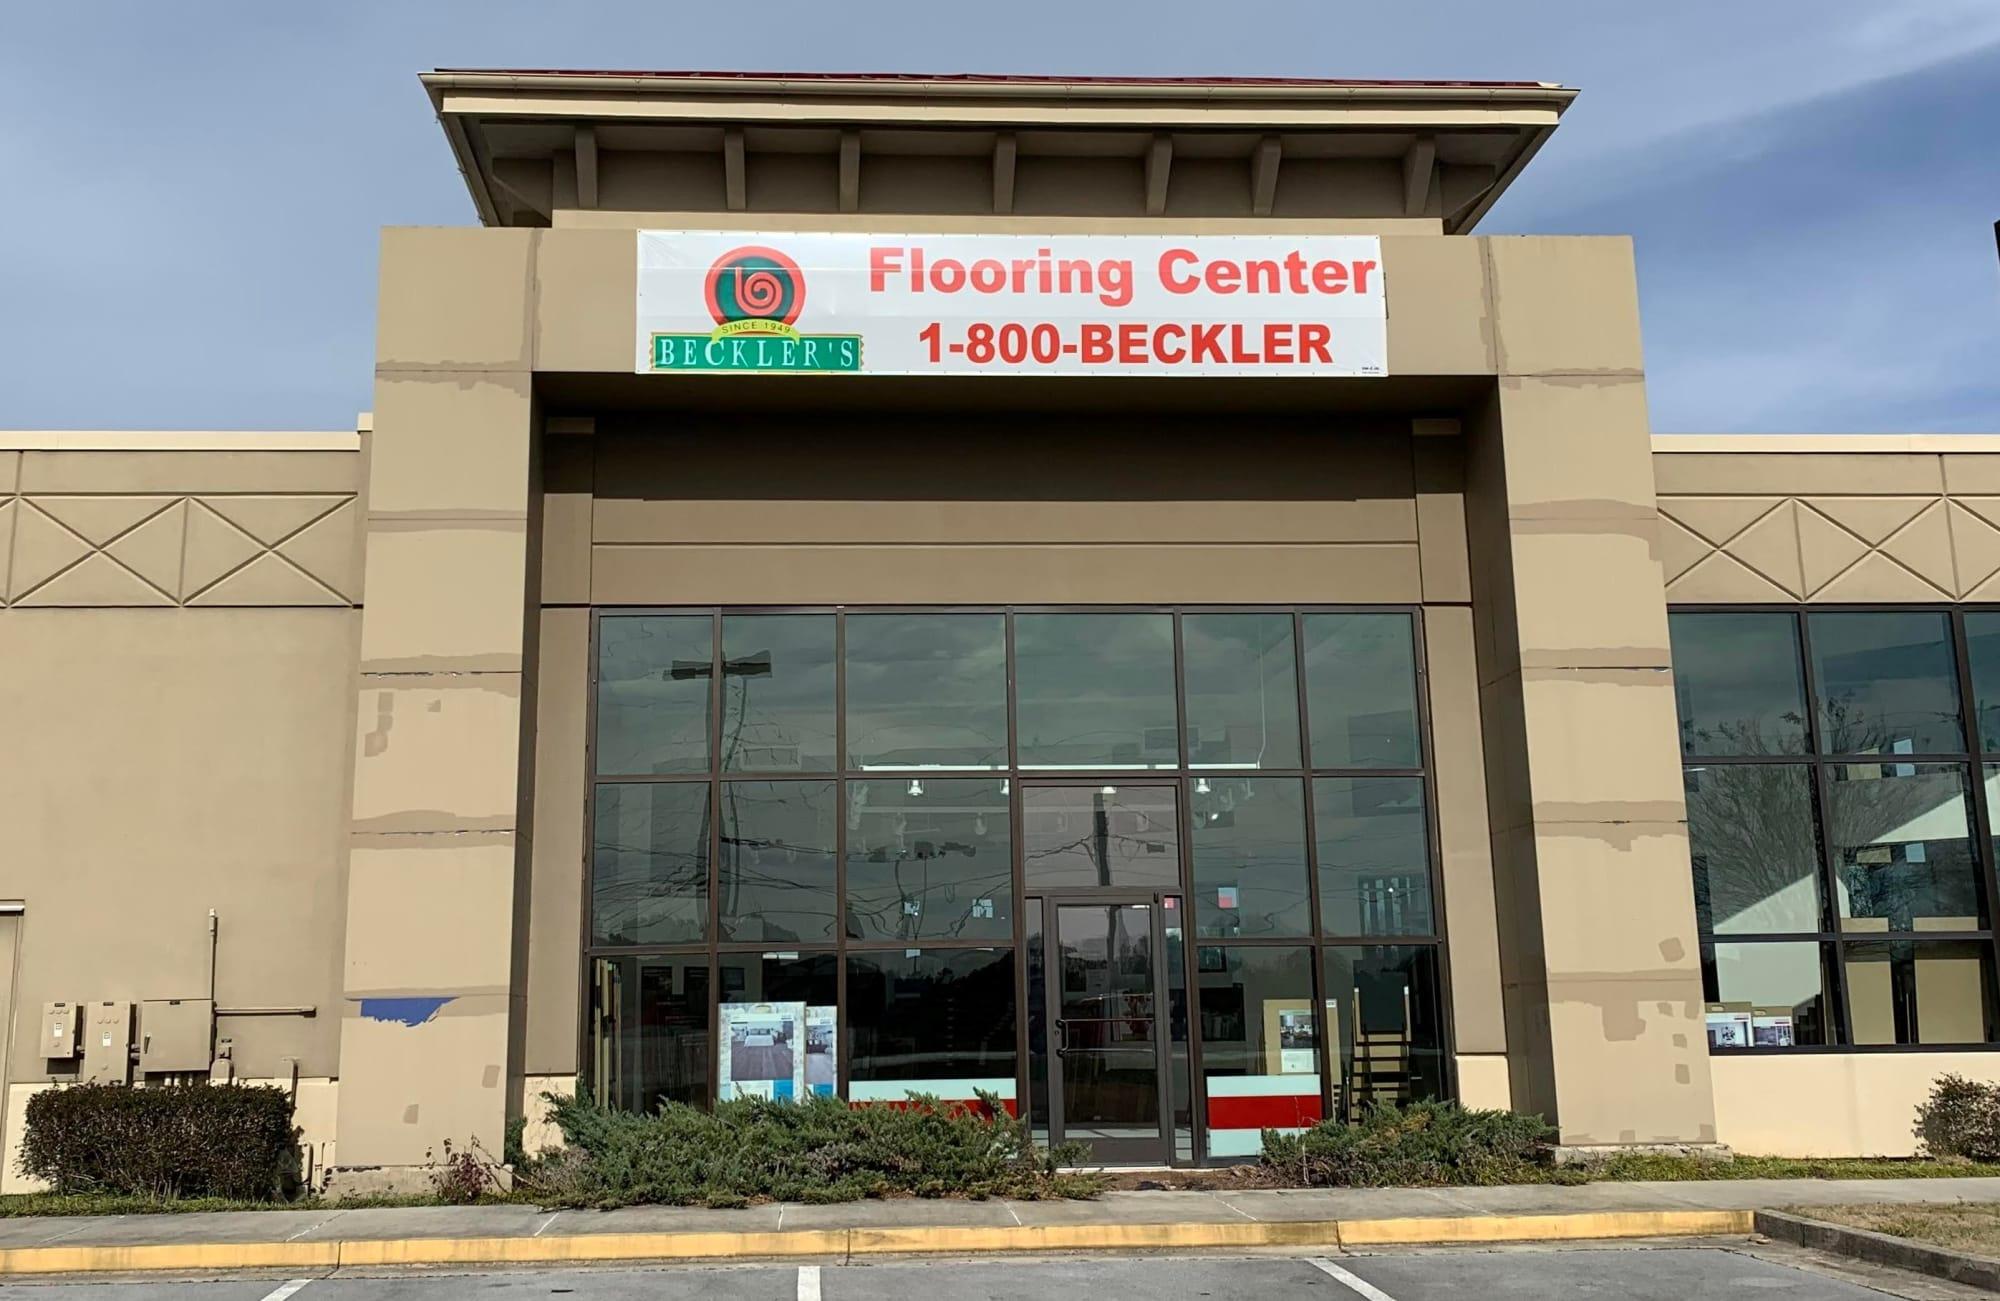 Beckler's Flooring Center - 3089 North Dug Gap Rd SW Dalton, GA 30720